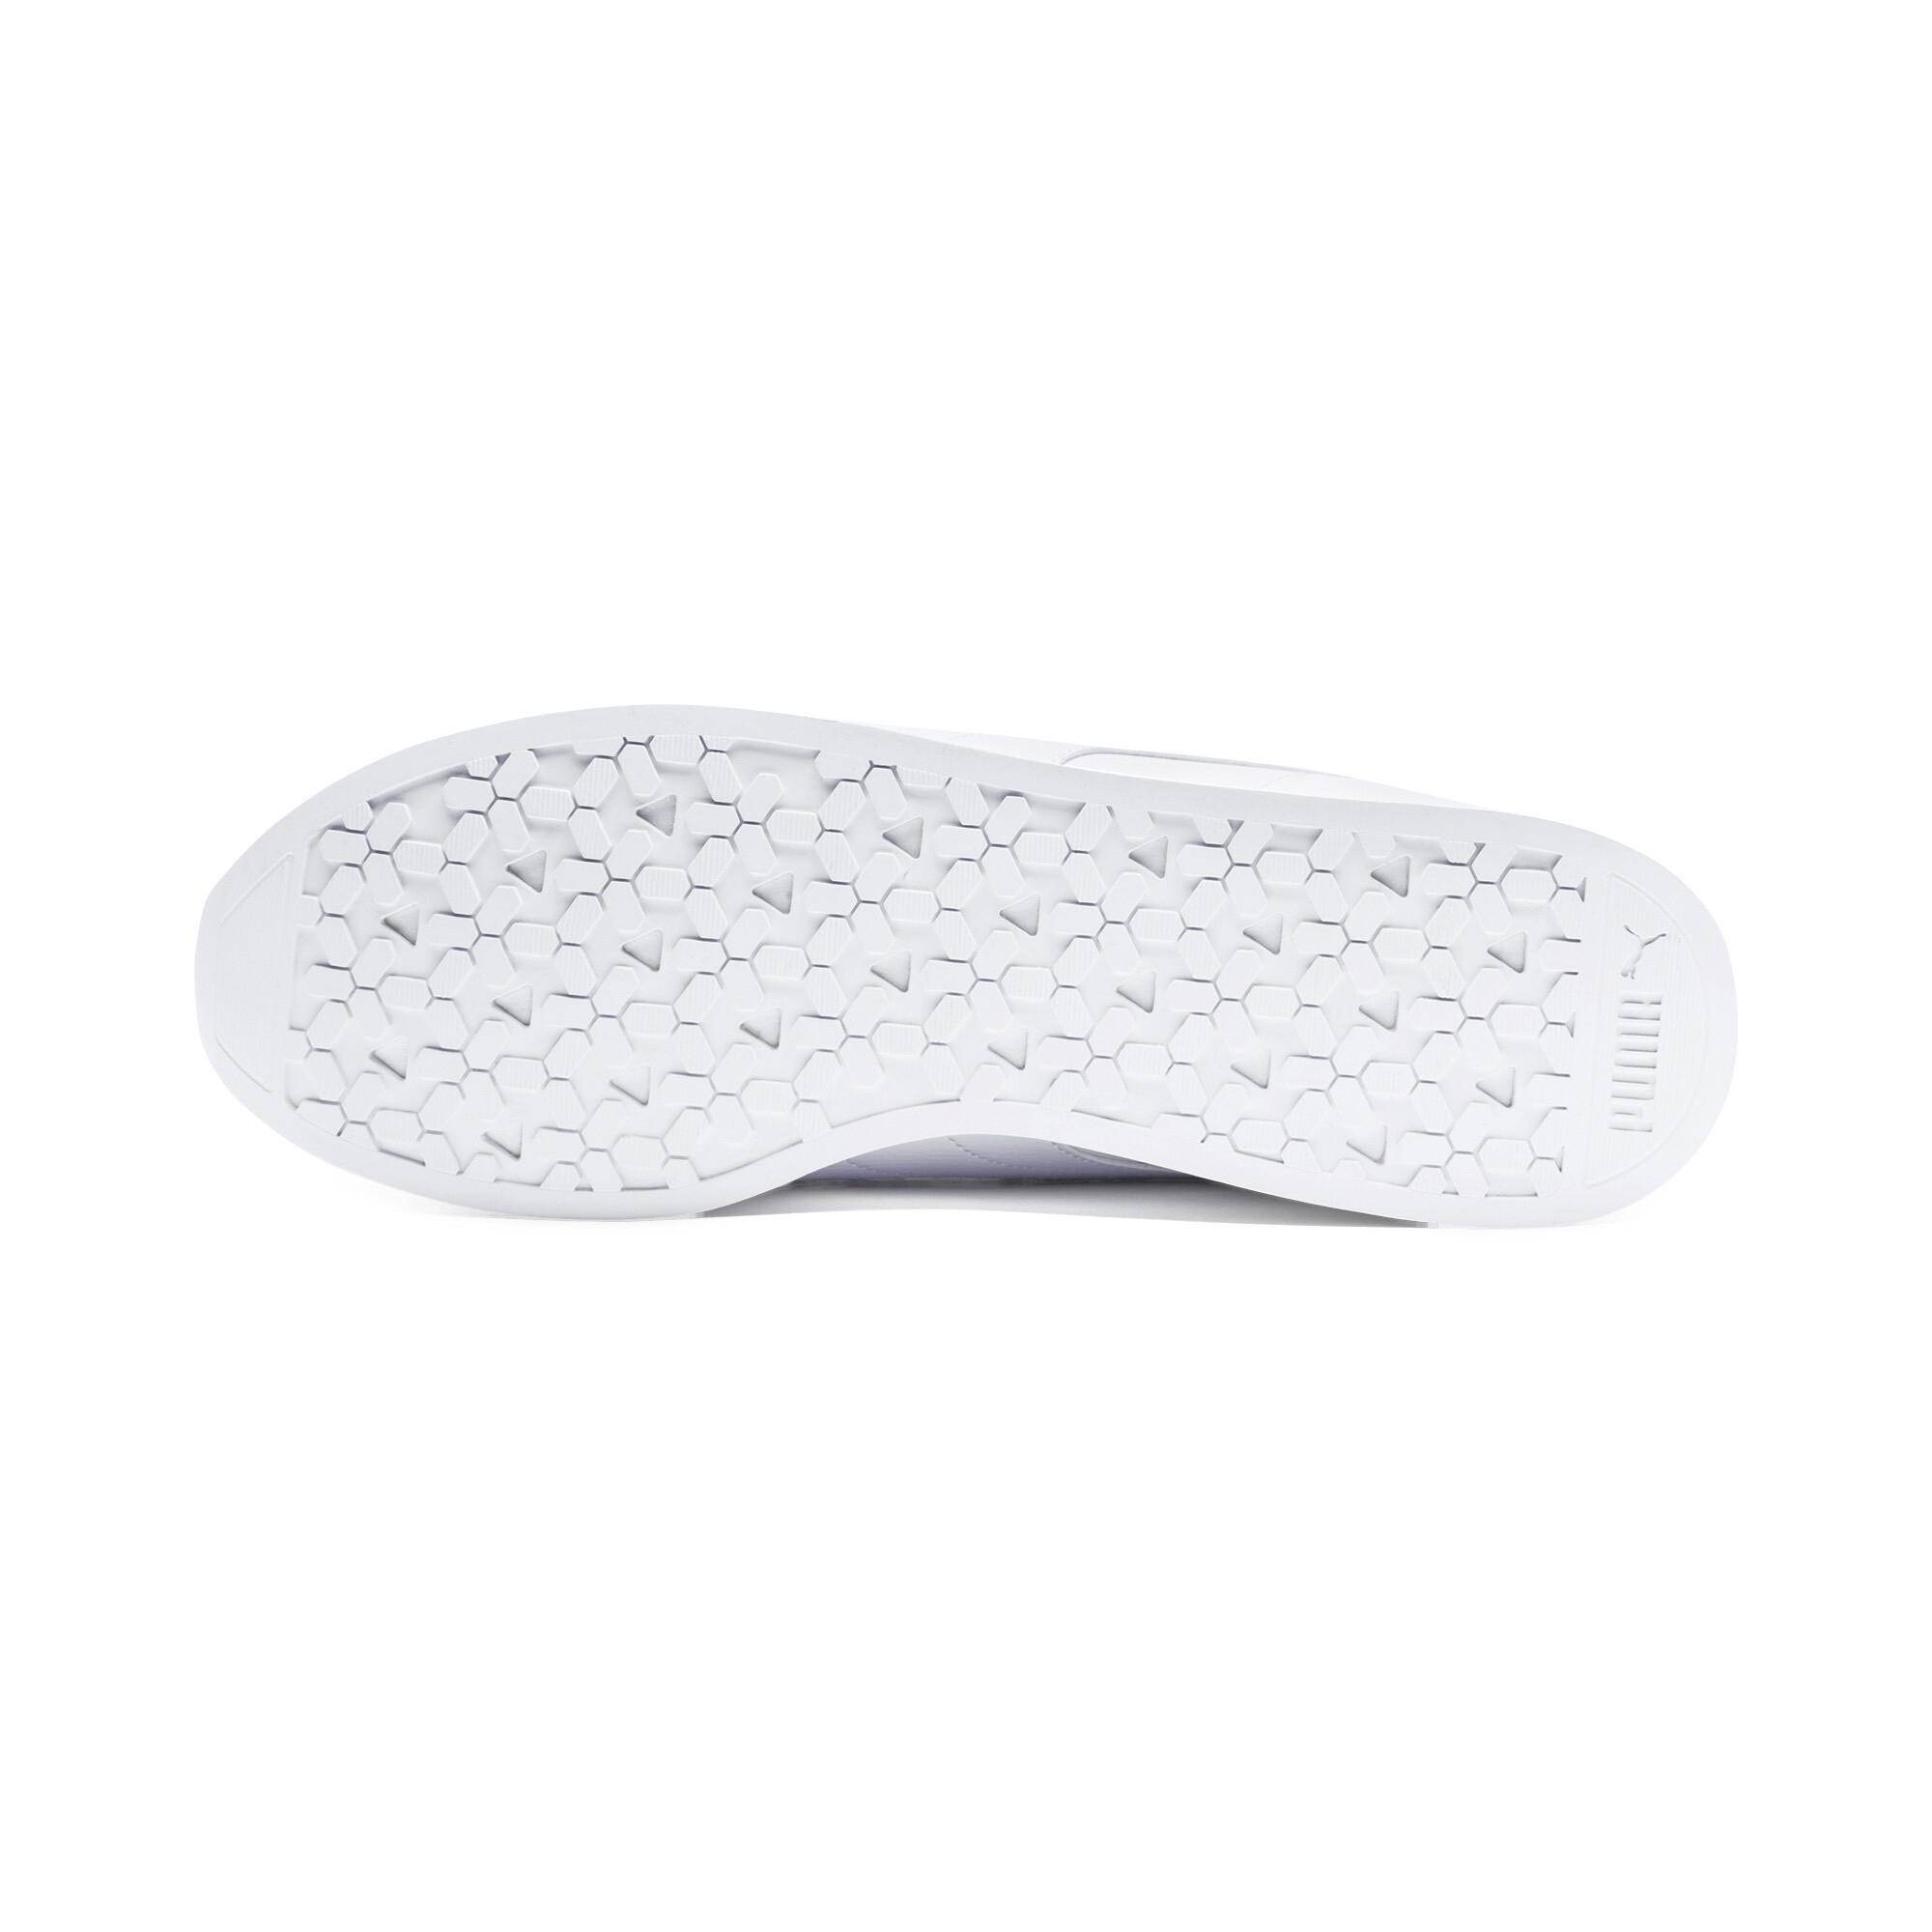 PUMA-Men-039-s-Turin-II-Sneakers thumbnail 11